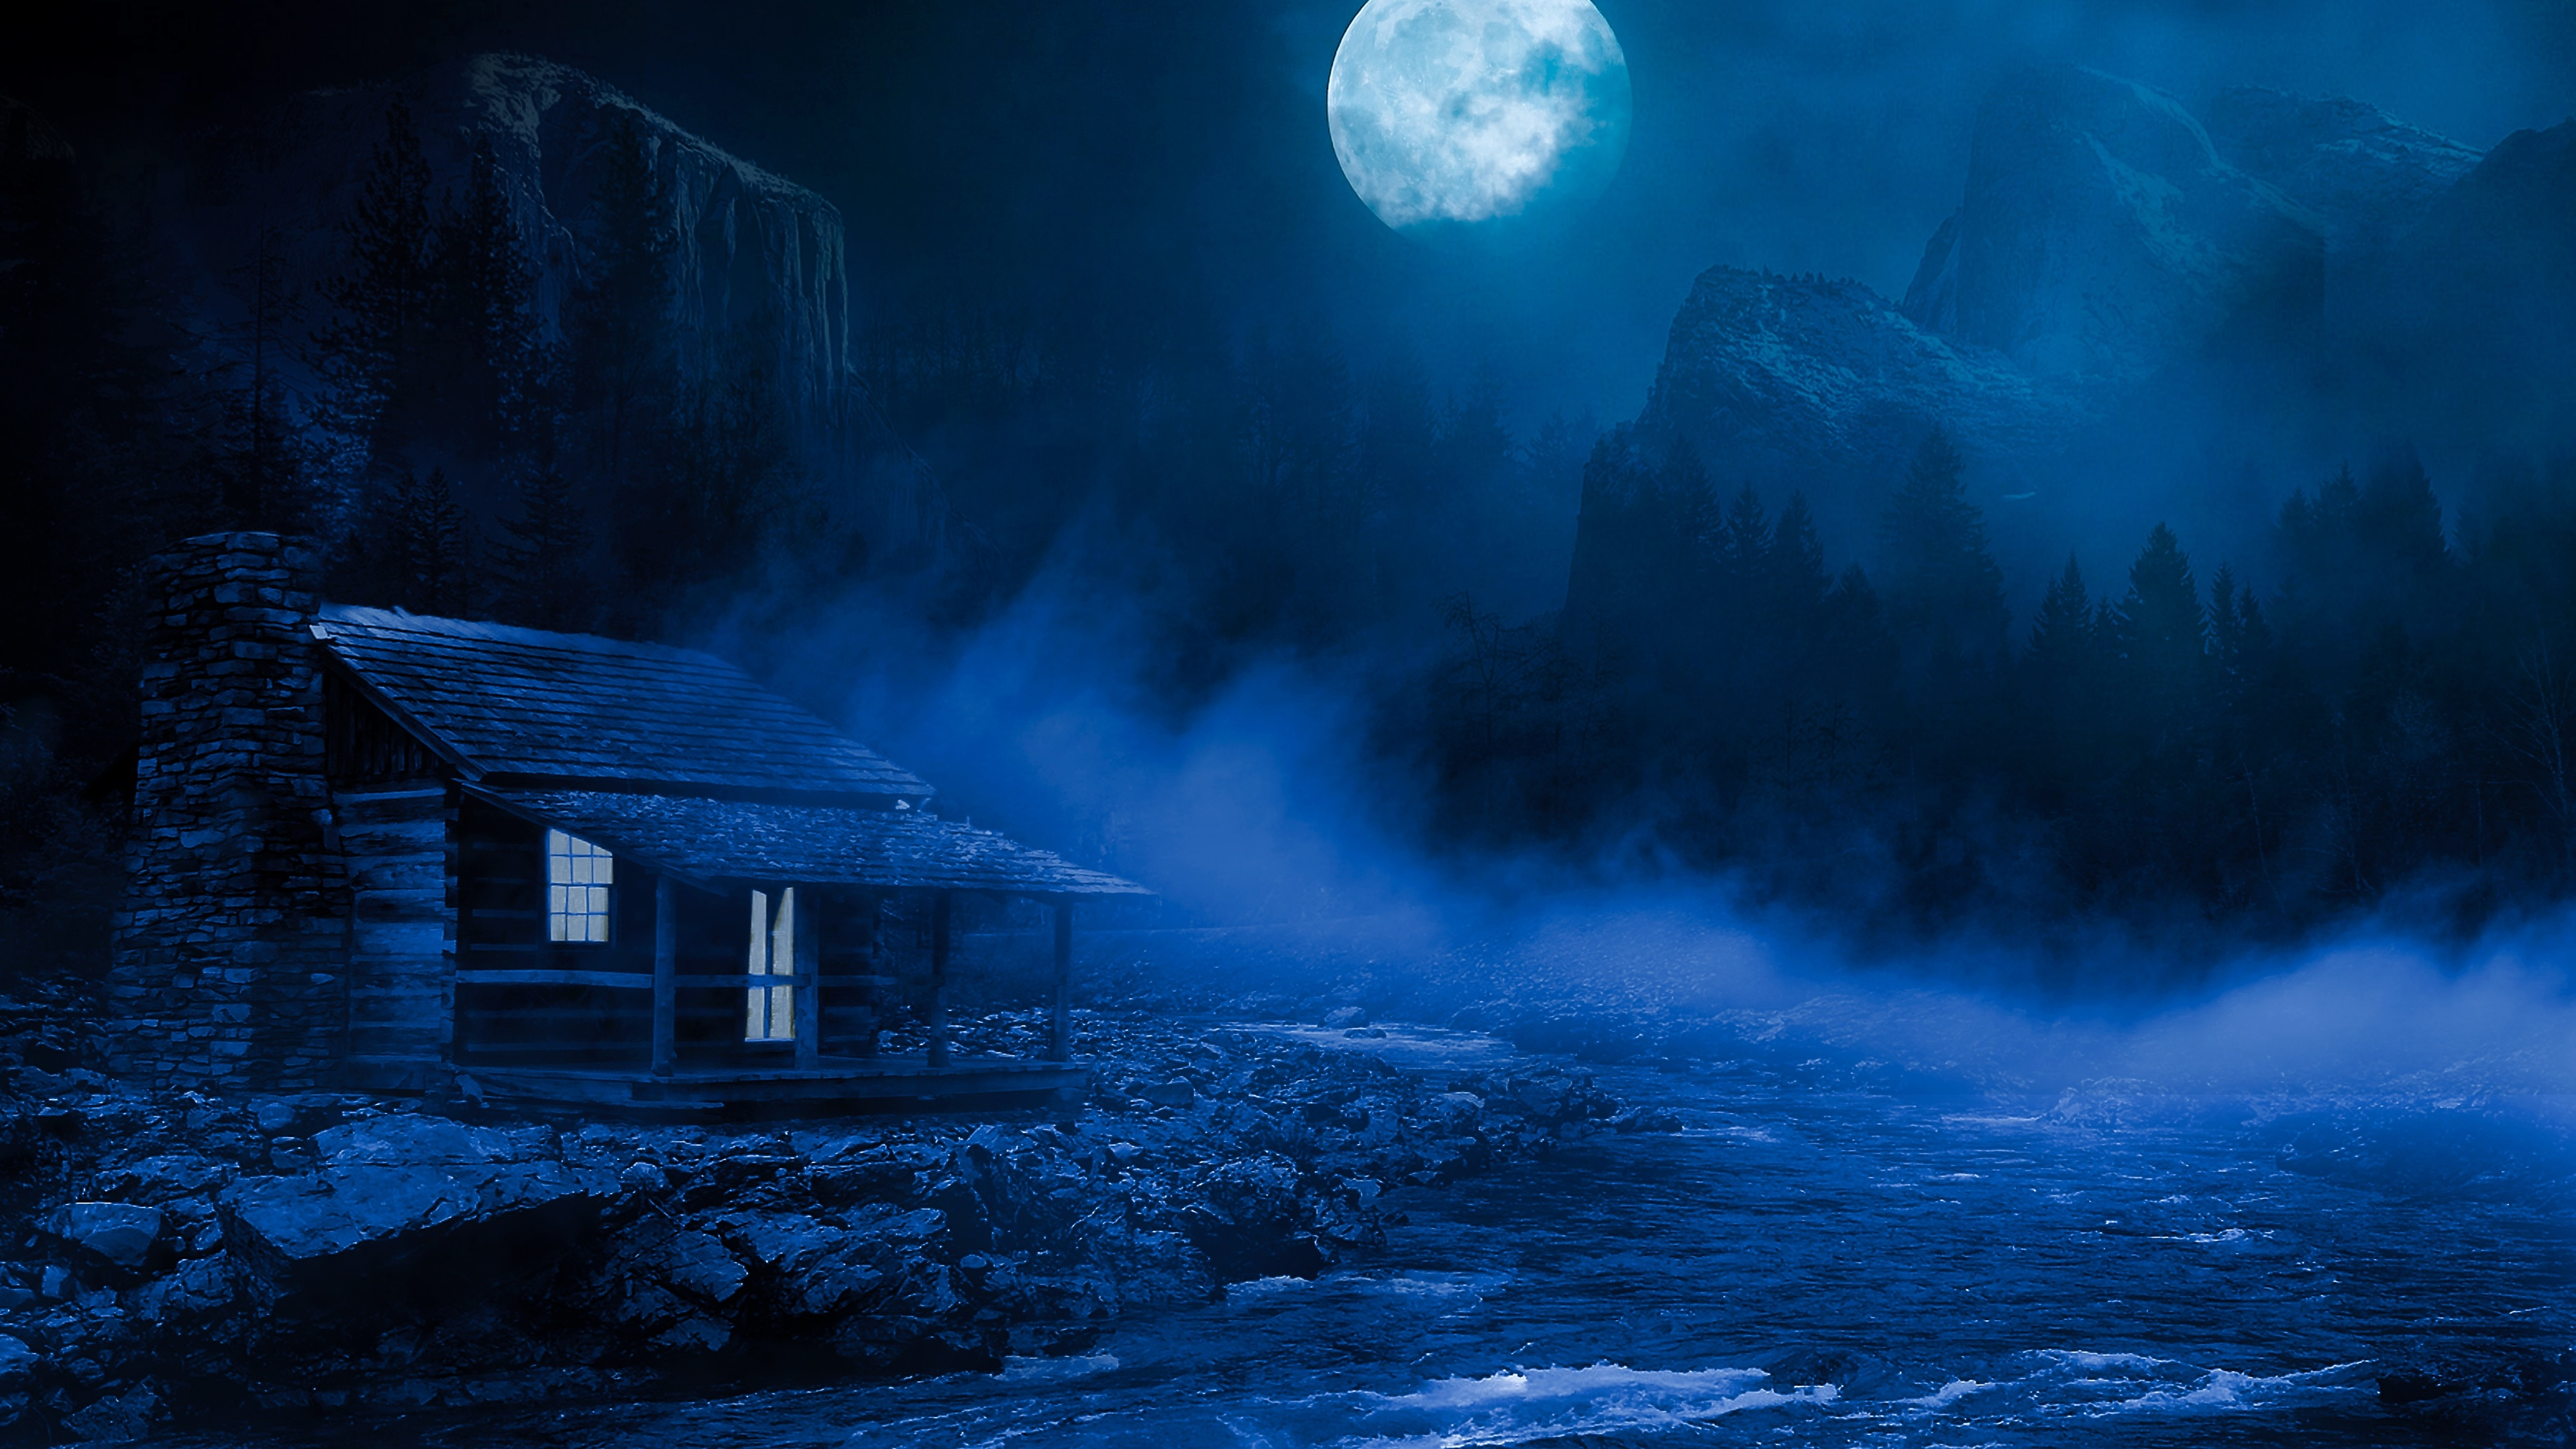 house night full moon fantasy lake flowing on side 5k 1540751656 - House Night Full Moon Fantasy Lake Flowing On Side 5k - moon wallpapers, lake wallpapers, house wallpapers, hd-wallpapers, fantasy wallpapers, digital art wallpapers, artwork wallpapers, artist wallpapers, 5k wallpapers, 4k-wallpapers